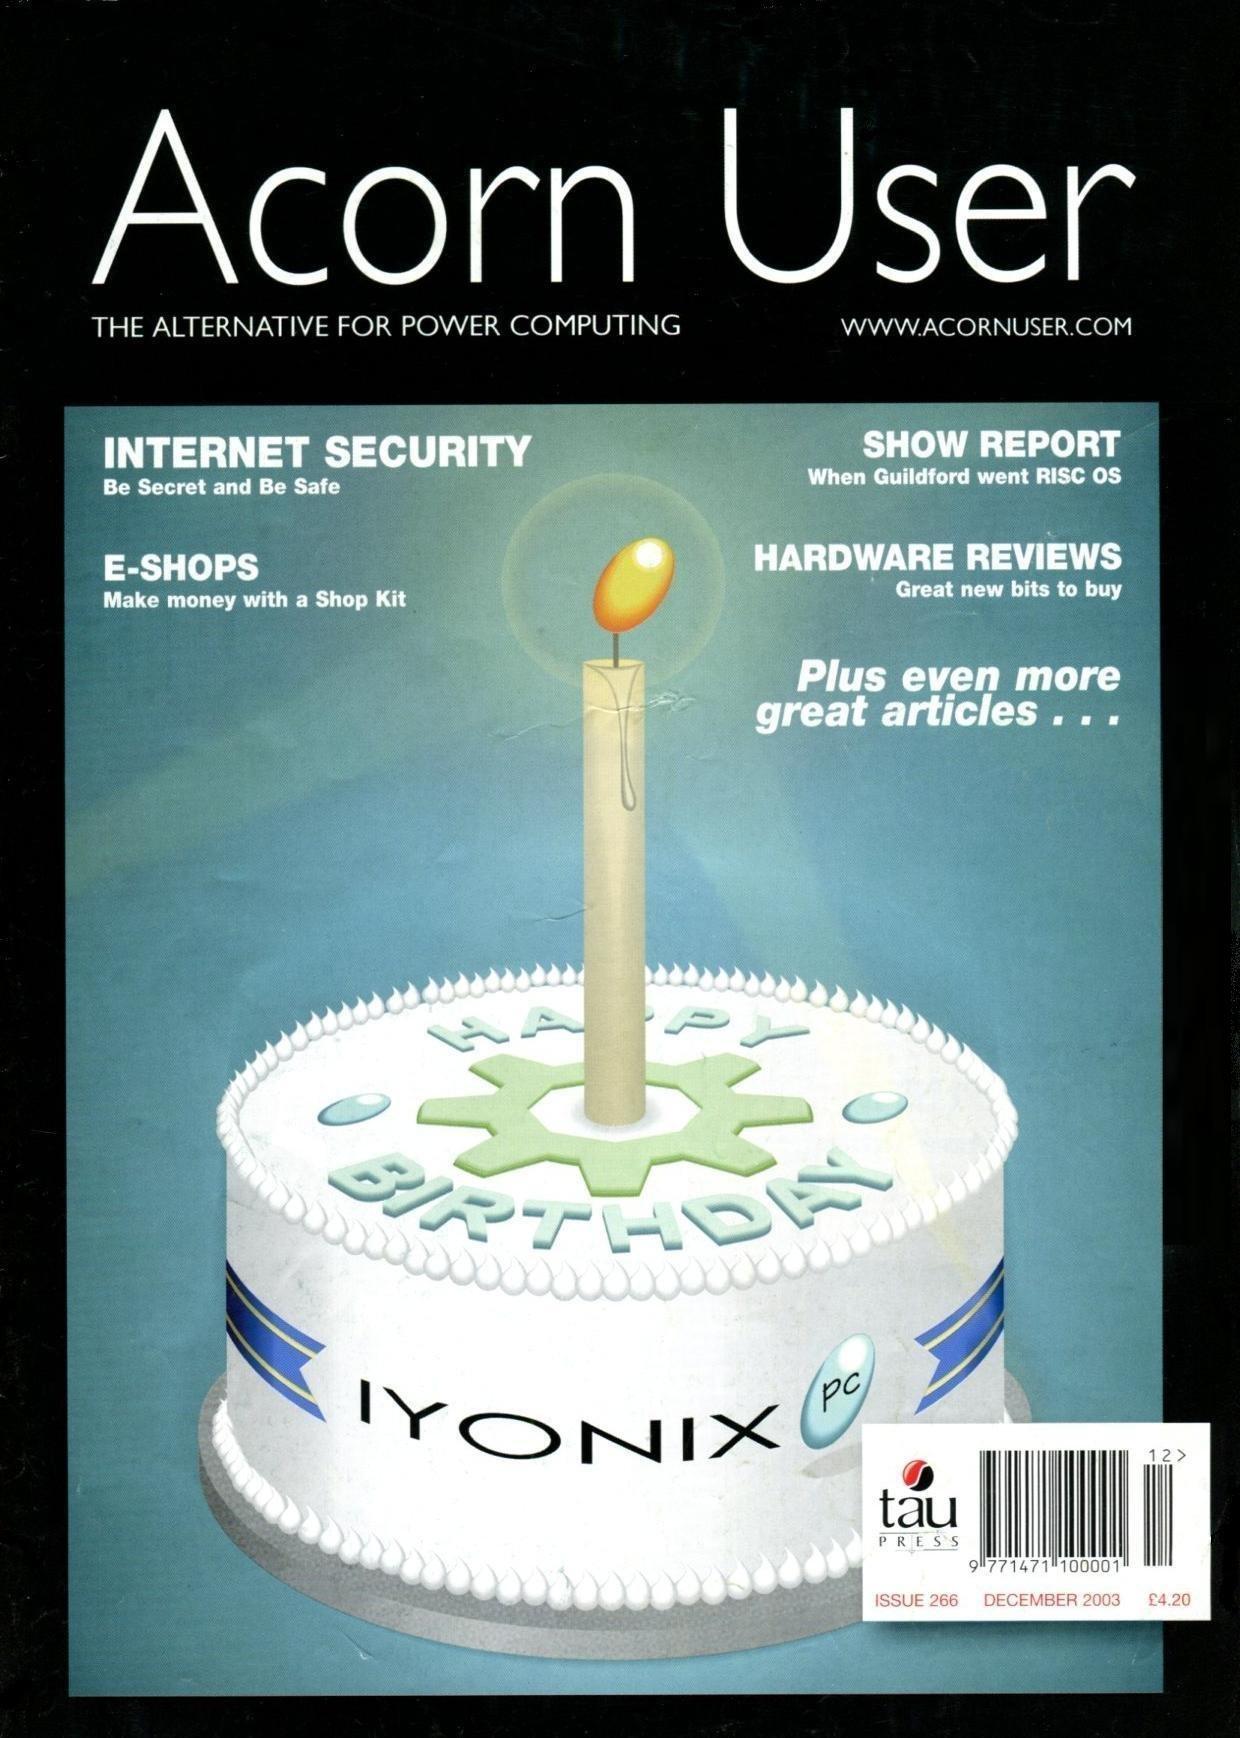 Acorn User 266 (December 2003)